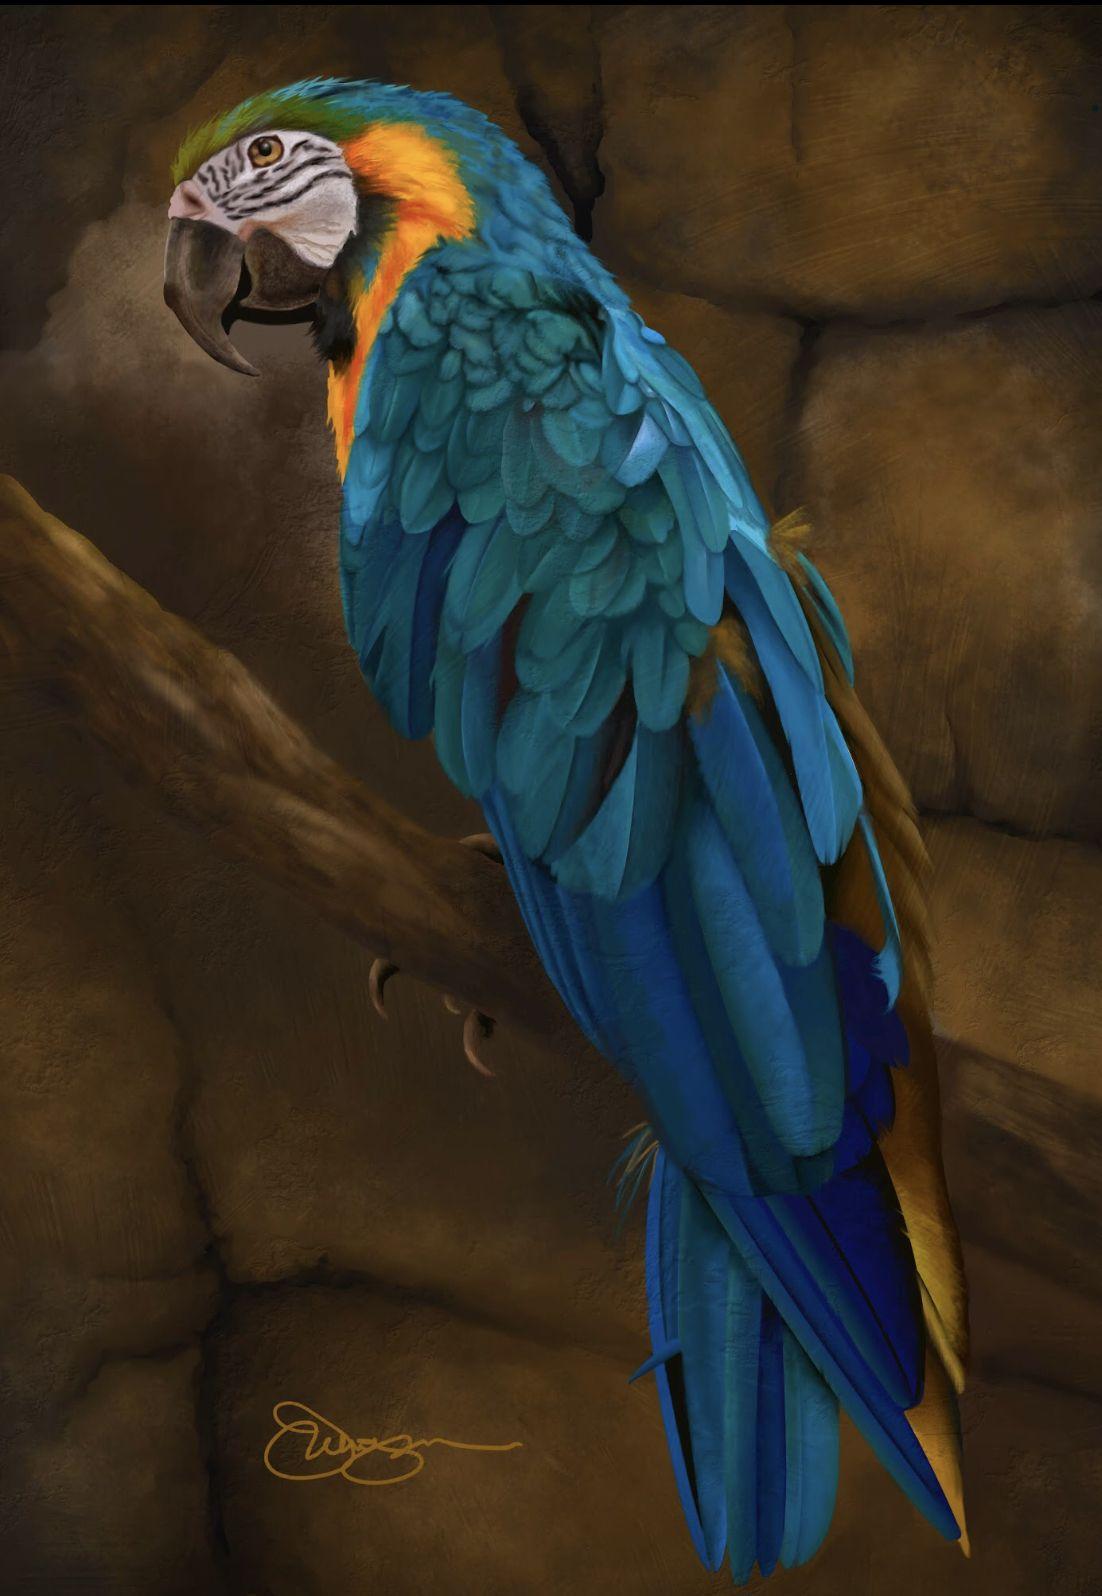 Blue Parrot Digital Art On Canvas Etsy Parrot Wallpaper Parrot Bird Pictures